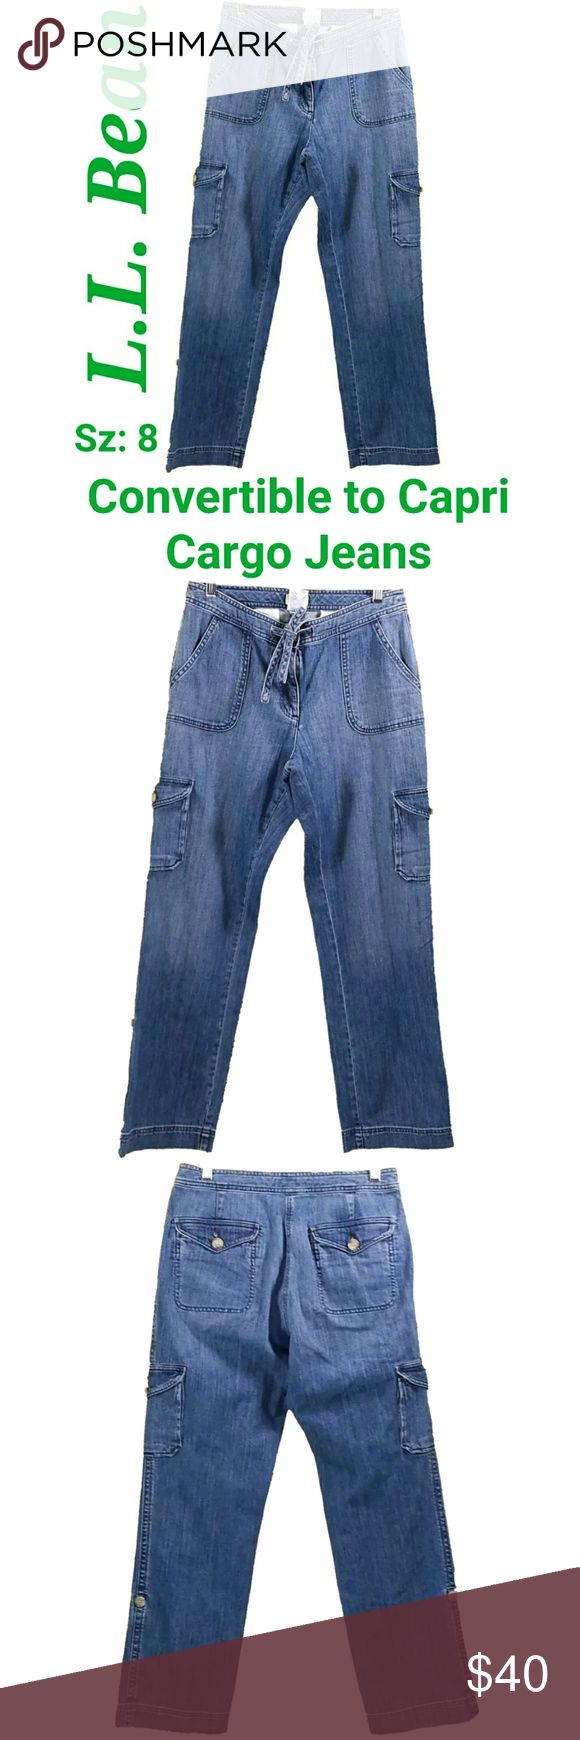 27 x 30 Waist Tie Womens LL Bean Medium Wash Cargo Convertible Capri Jeans Size: 8 (27x30)  About this item: Excellent Condition Cargo Convert to Capri 99% Cotton 1% Spandex  Size: 8 Waist: 27 Inseam: 30 Rise: 9.5 L.L. Bean Jeans